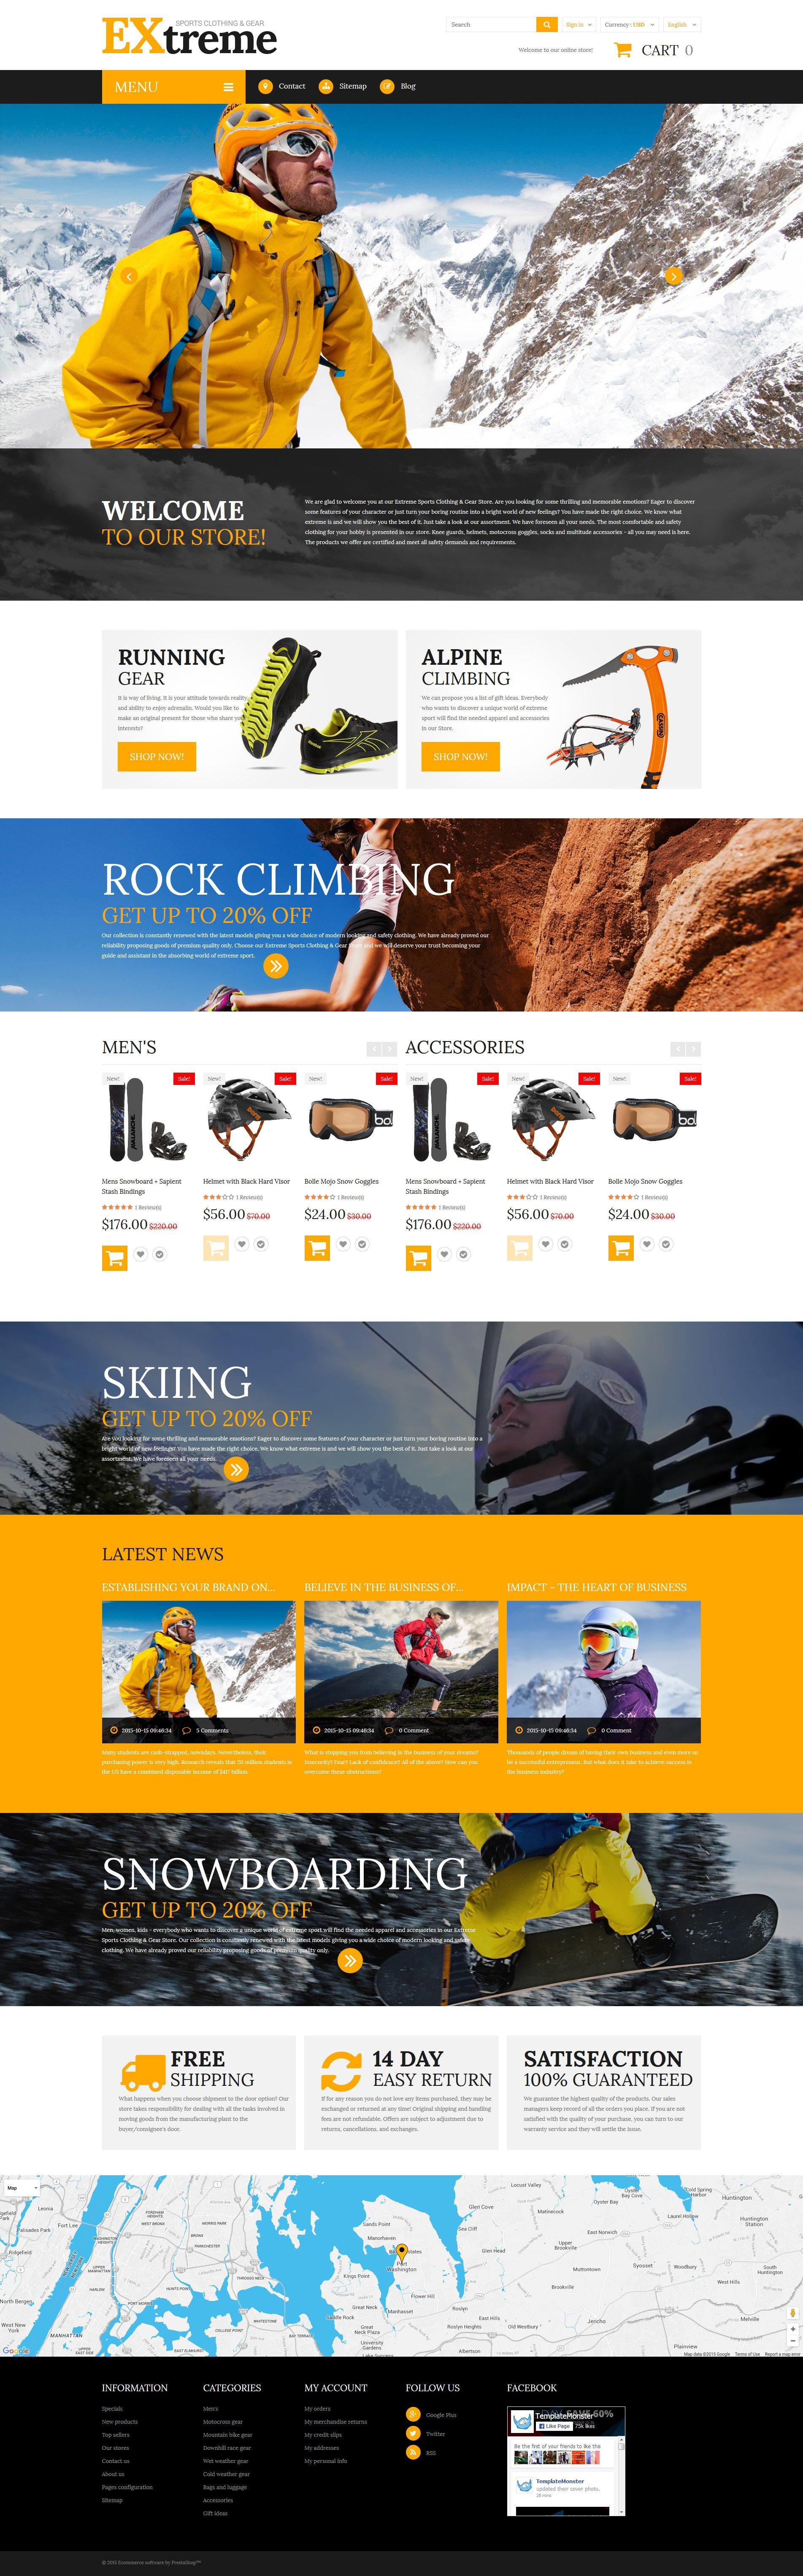 Extreme Sports Clothing PrestaShop Theme - screenshot